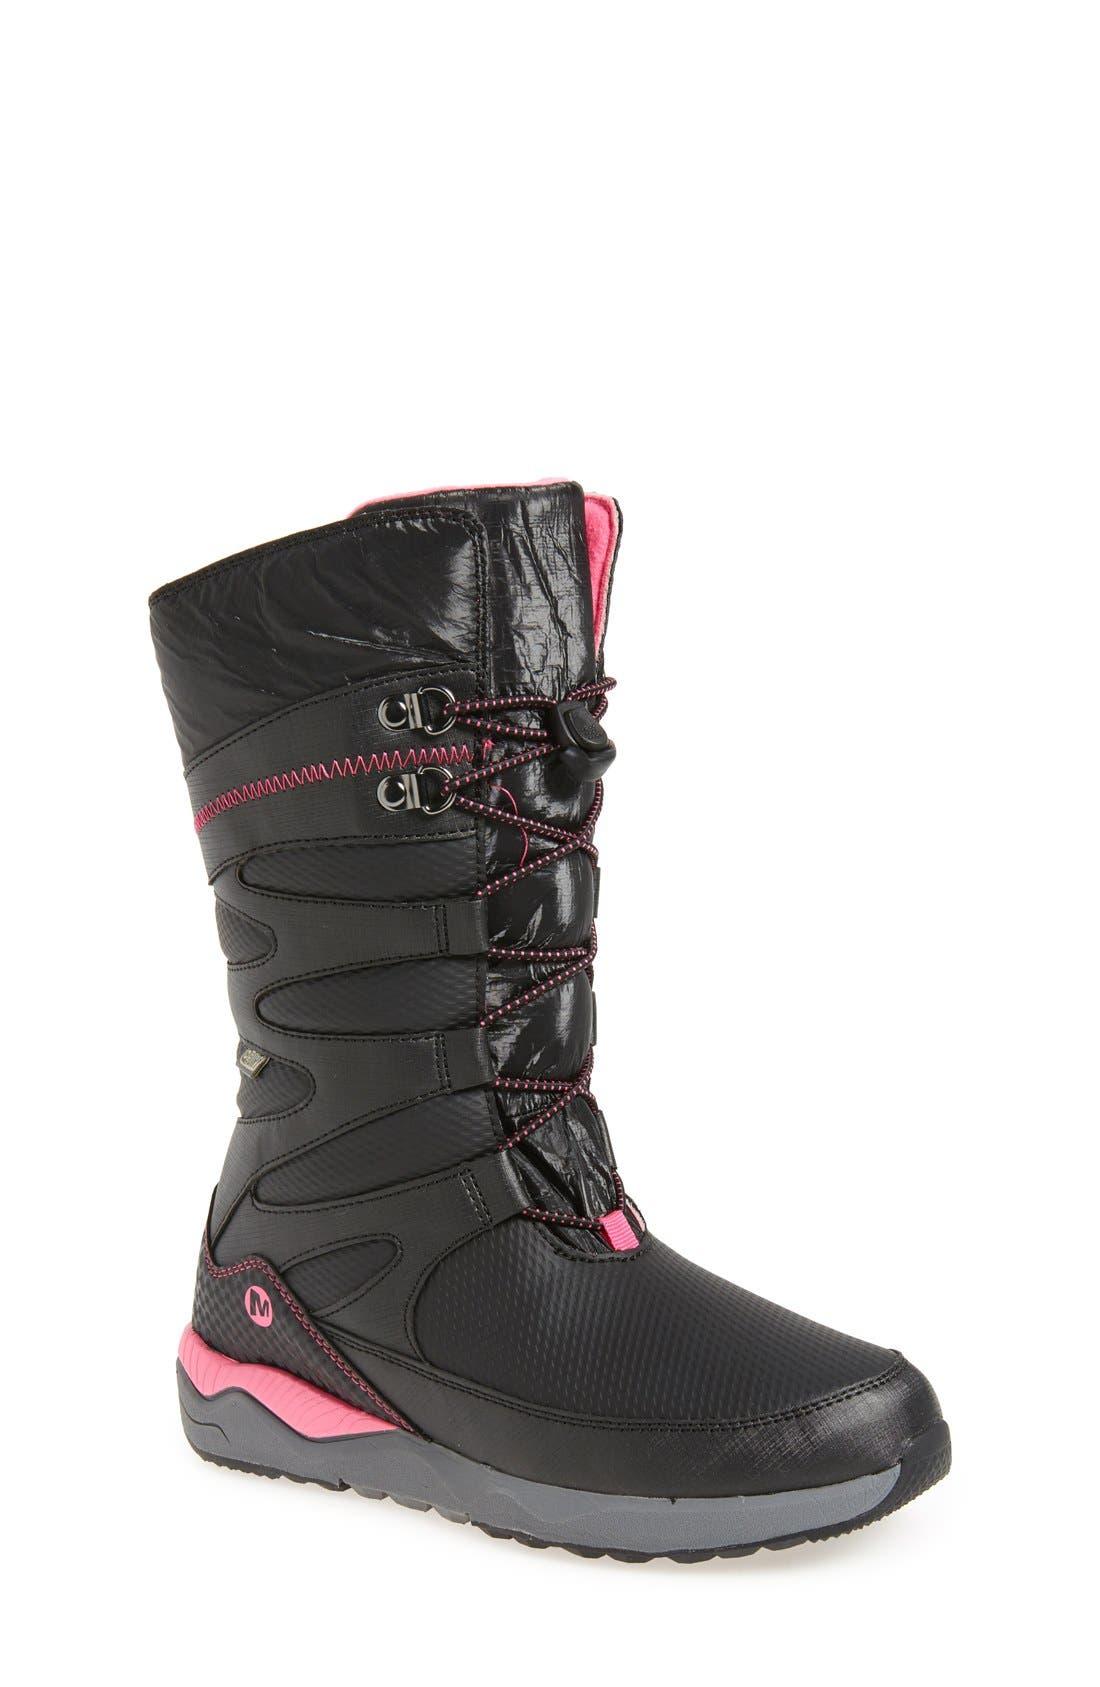 'Arctic Blast' Waterproof Snow Boot,                             Main thumbnail 1, color,                             Black/ Pink